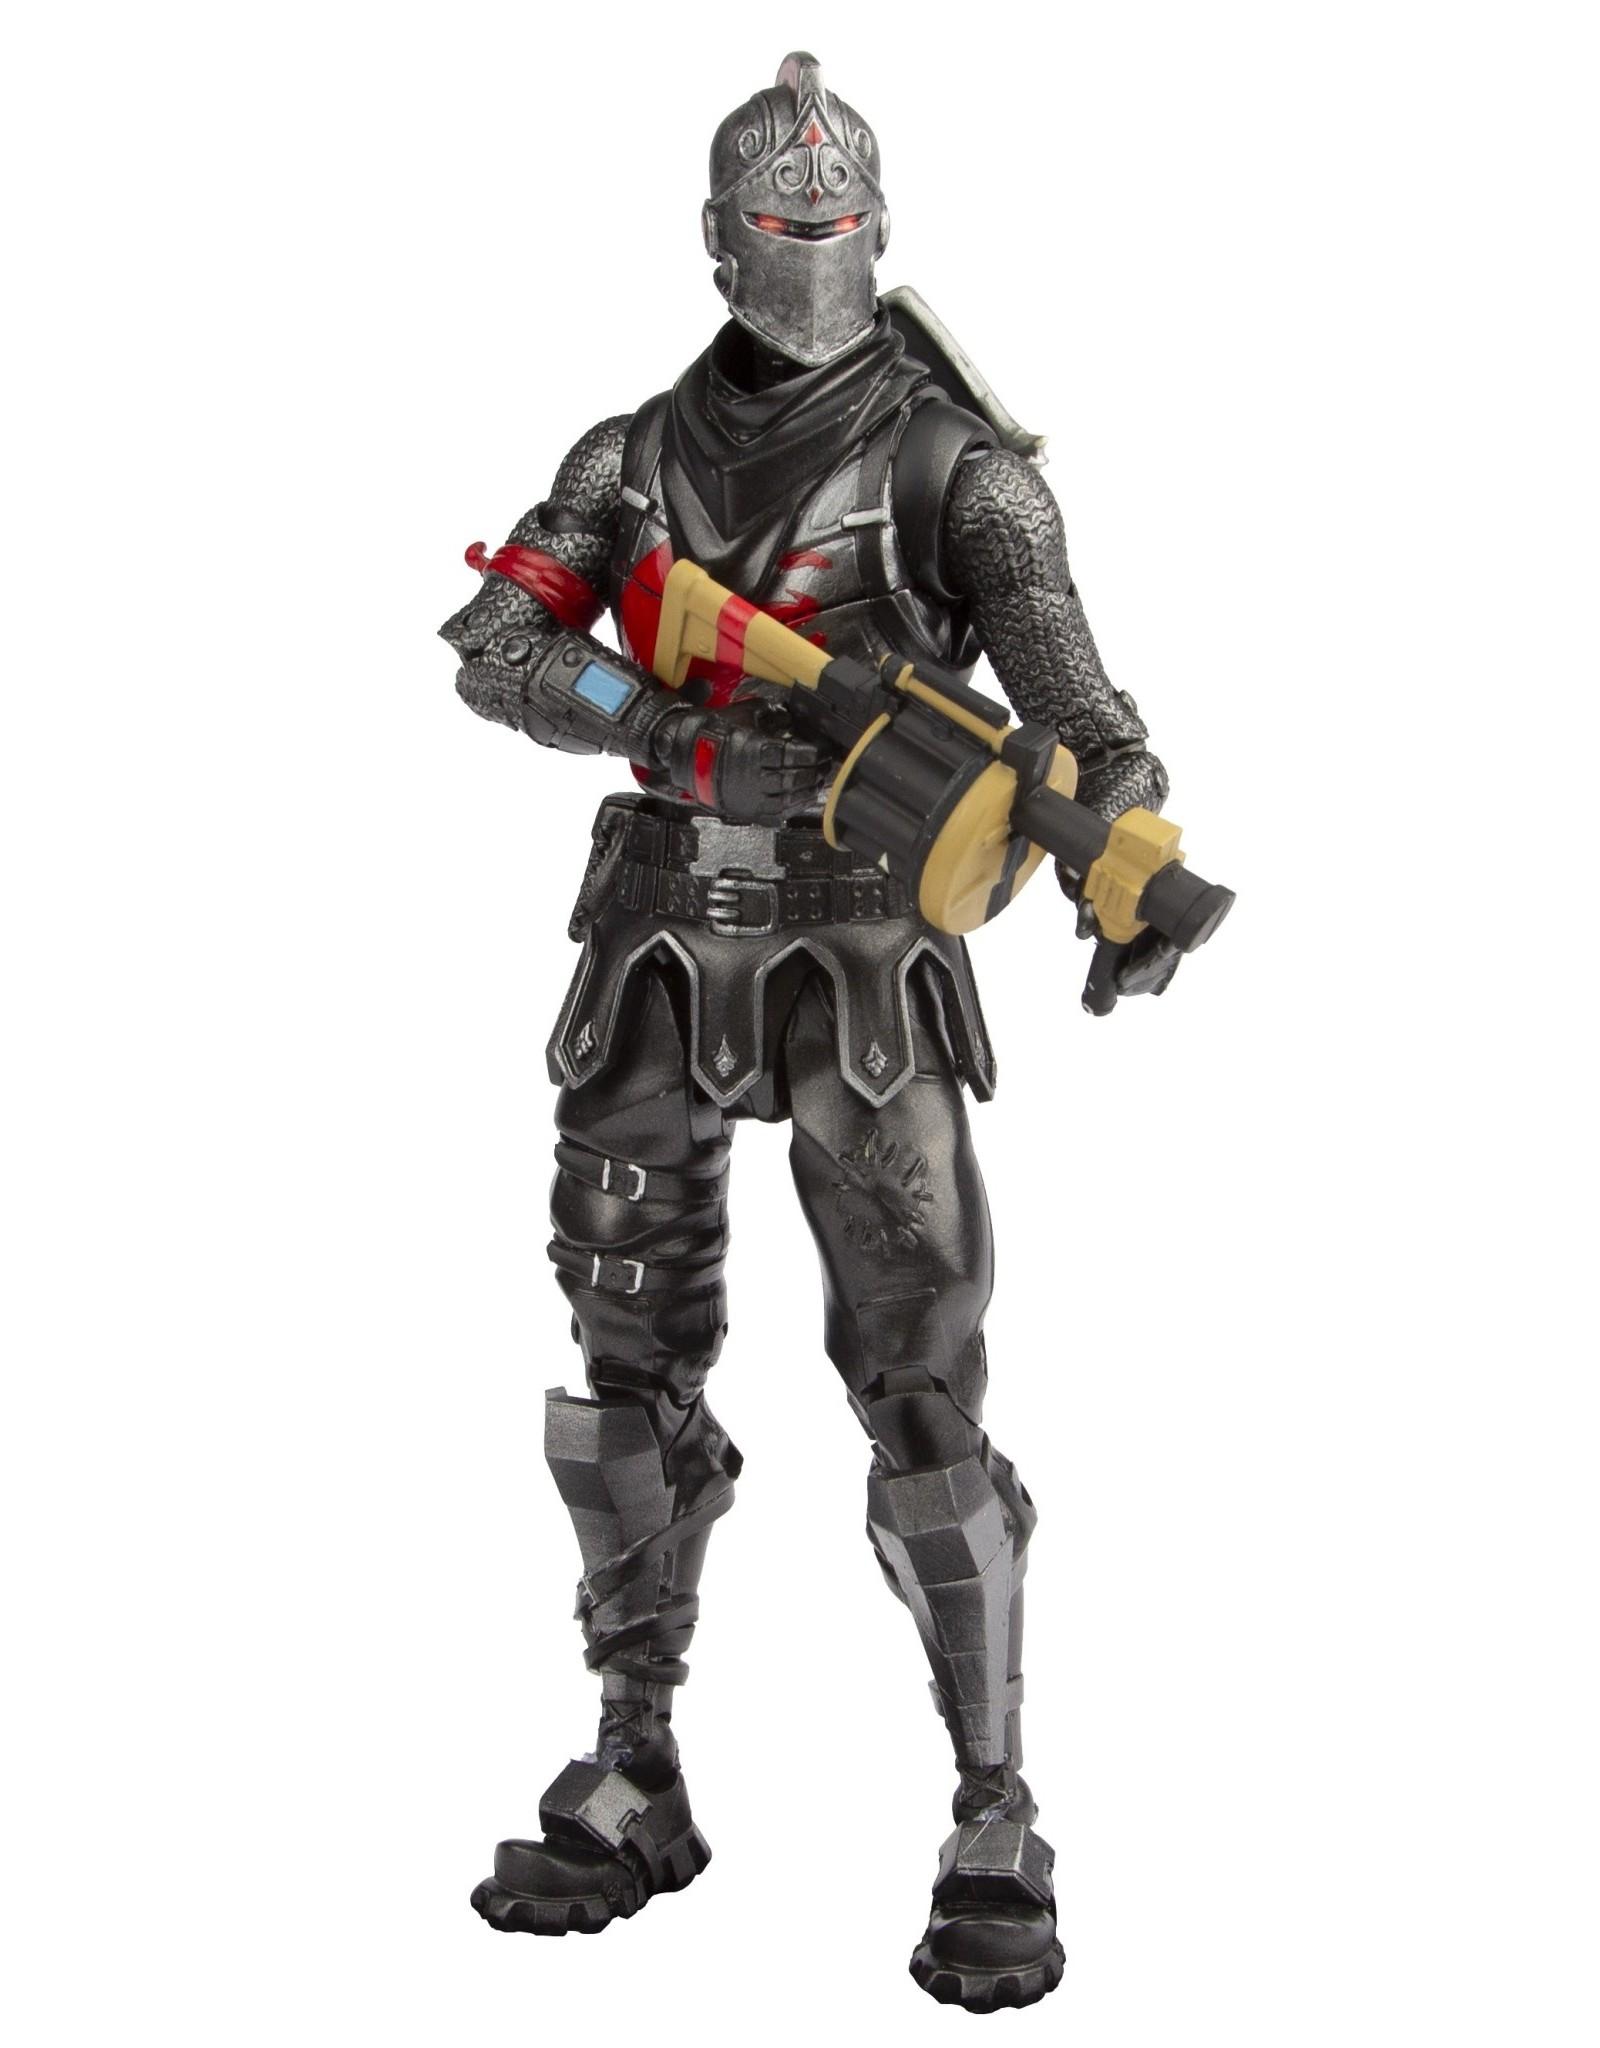 McFarlane Toys McFarlane Toys Fortnite Black Knight Premium Action Figure